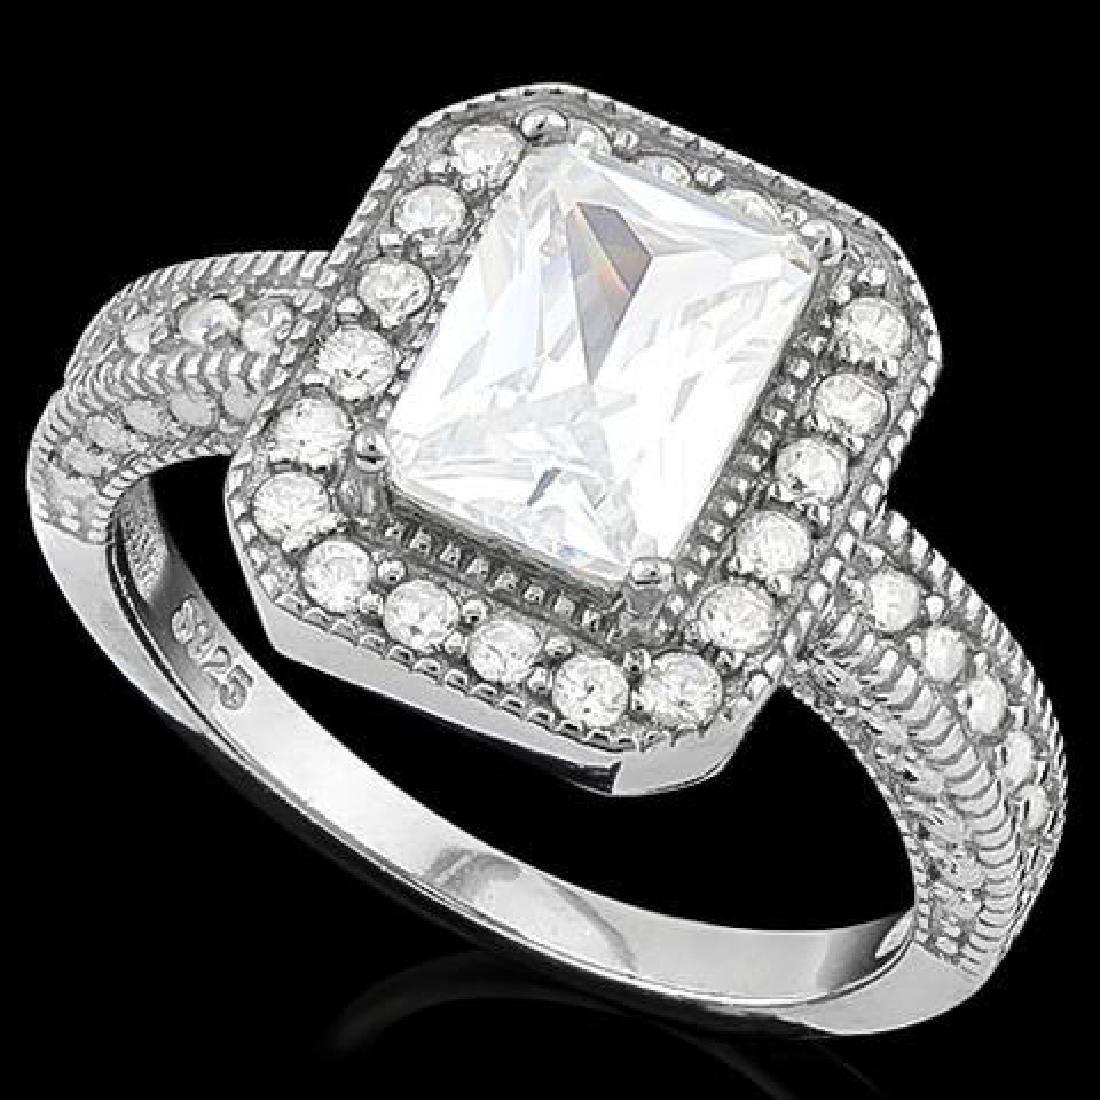 2 CARAT (35 PCS) FLAWLESS CREATED DIAMOND 925 STERLING